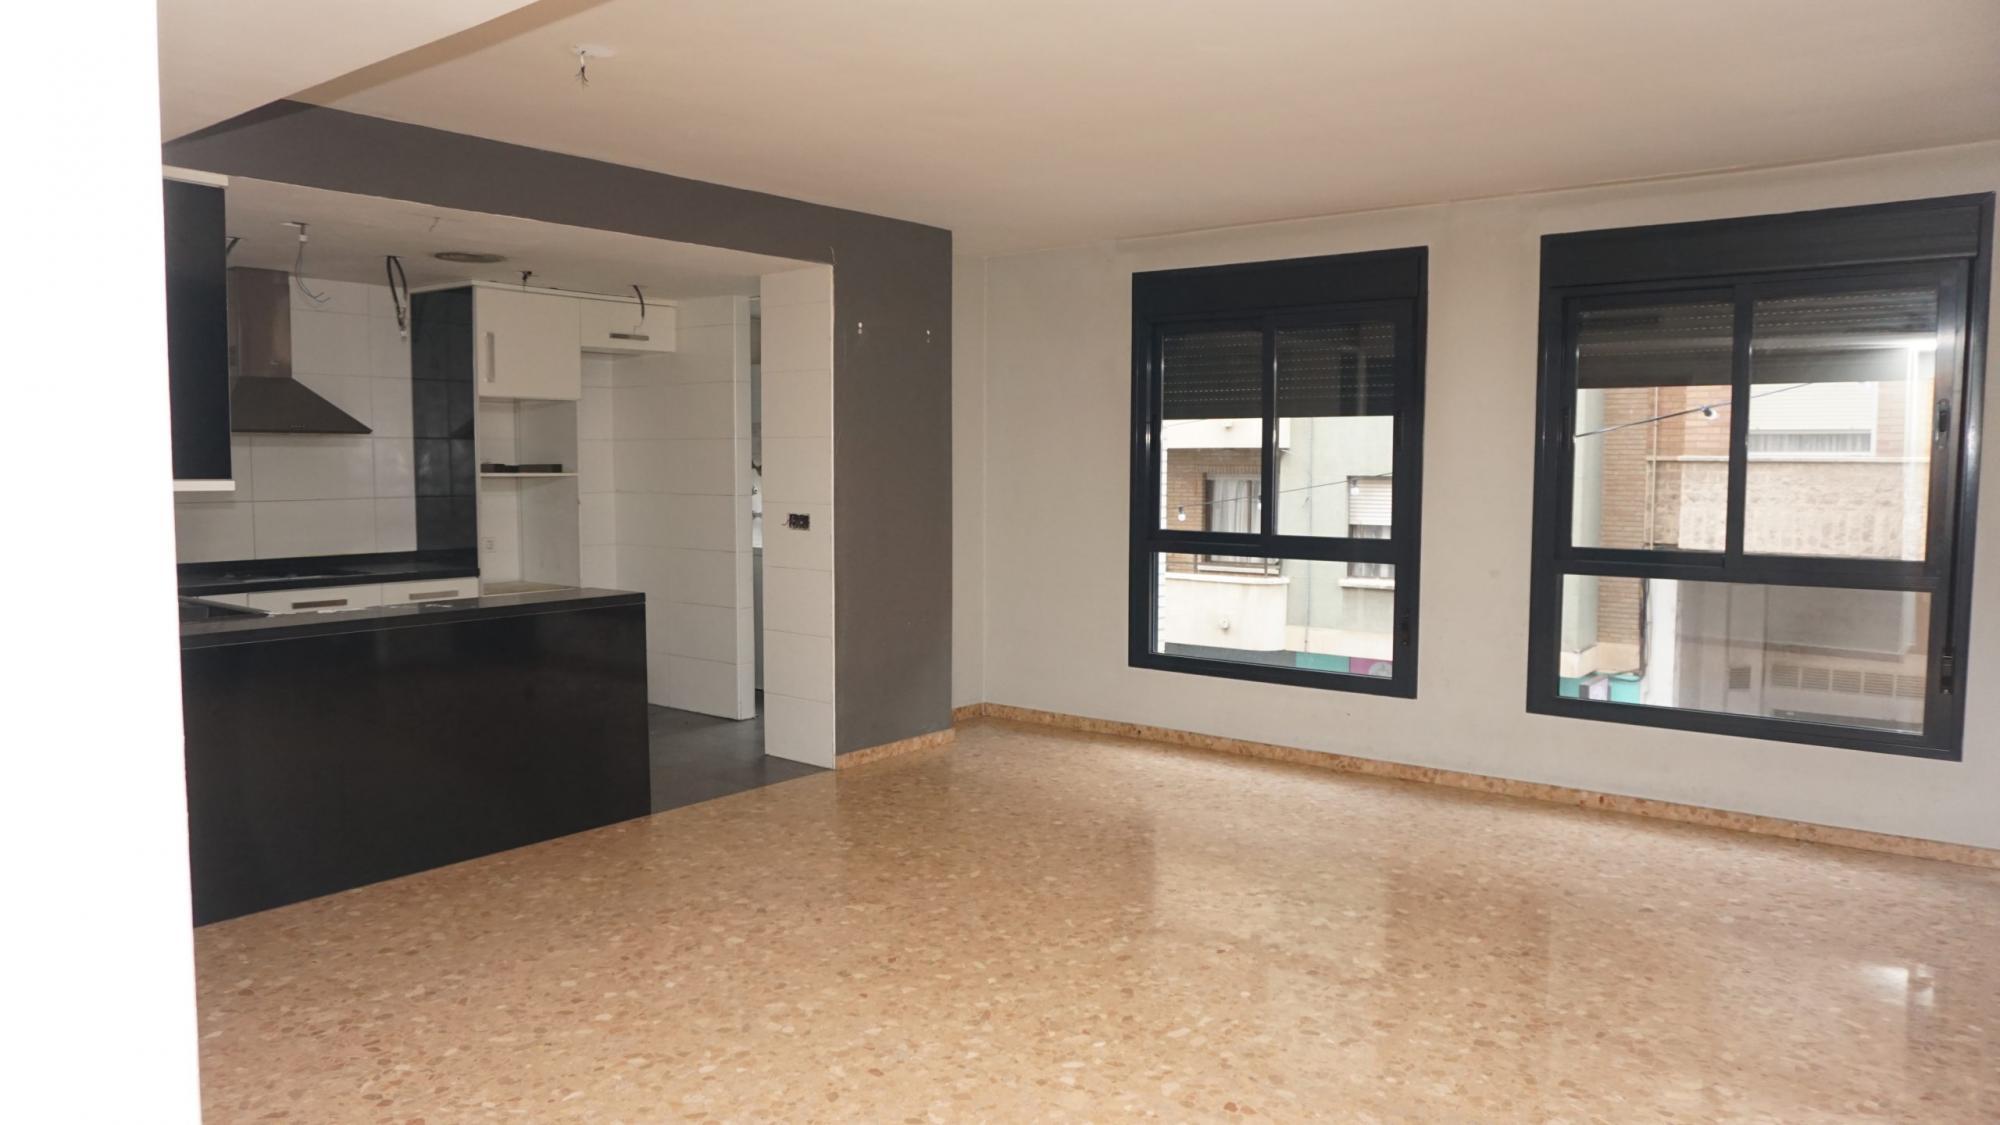 Vivienda en venta en Burriana (Castellón) zona centro